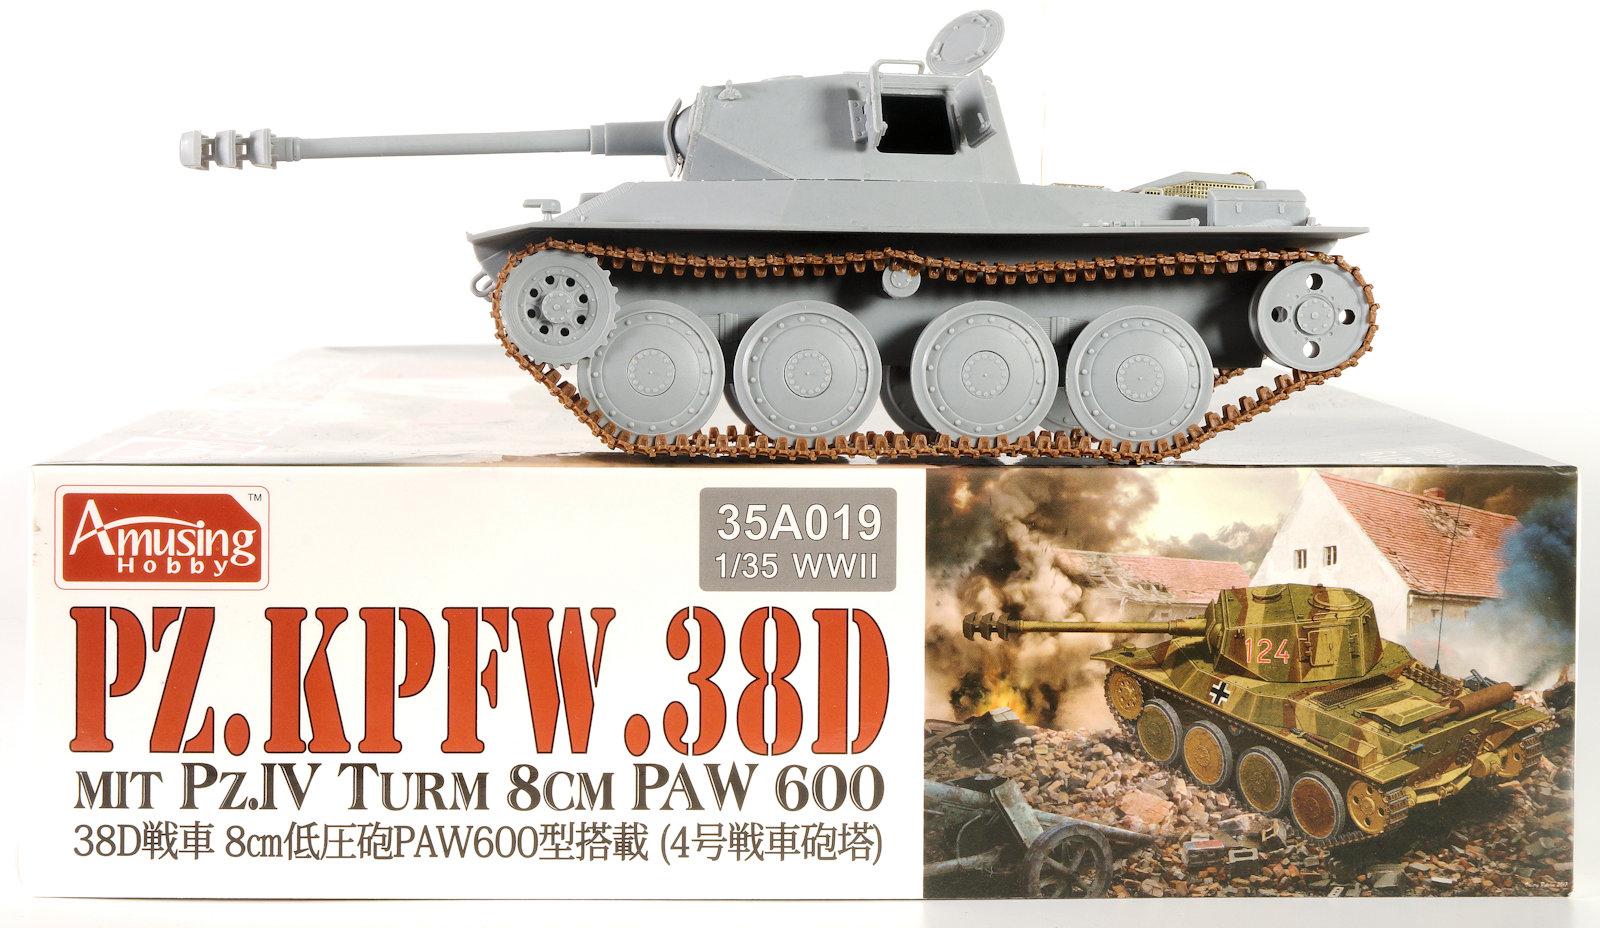 The Modelling News: Build Guide:Pz Kpfw 38D mitt PZ IV turm